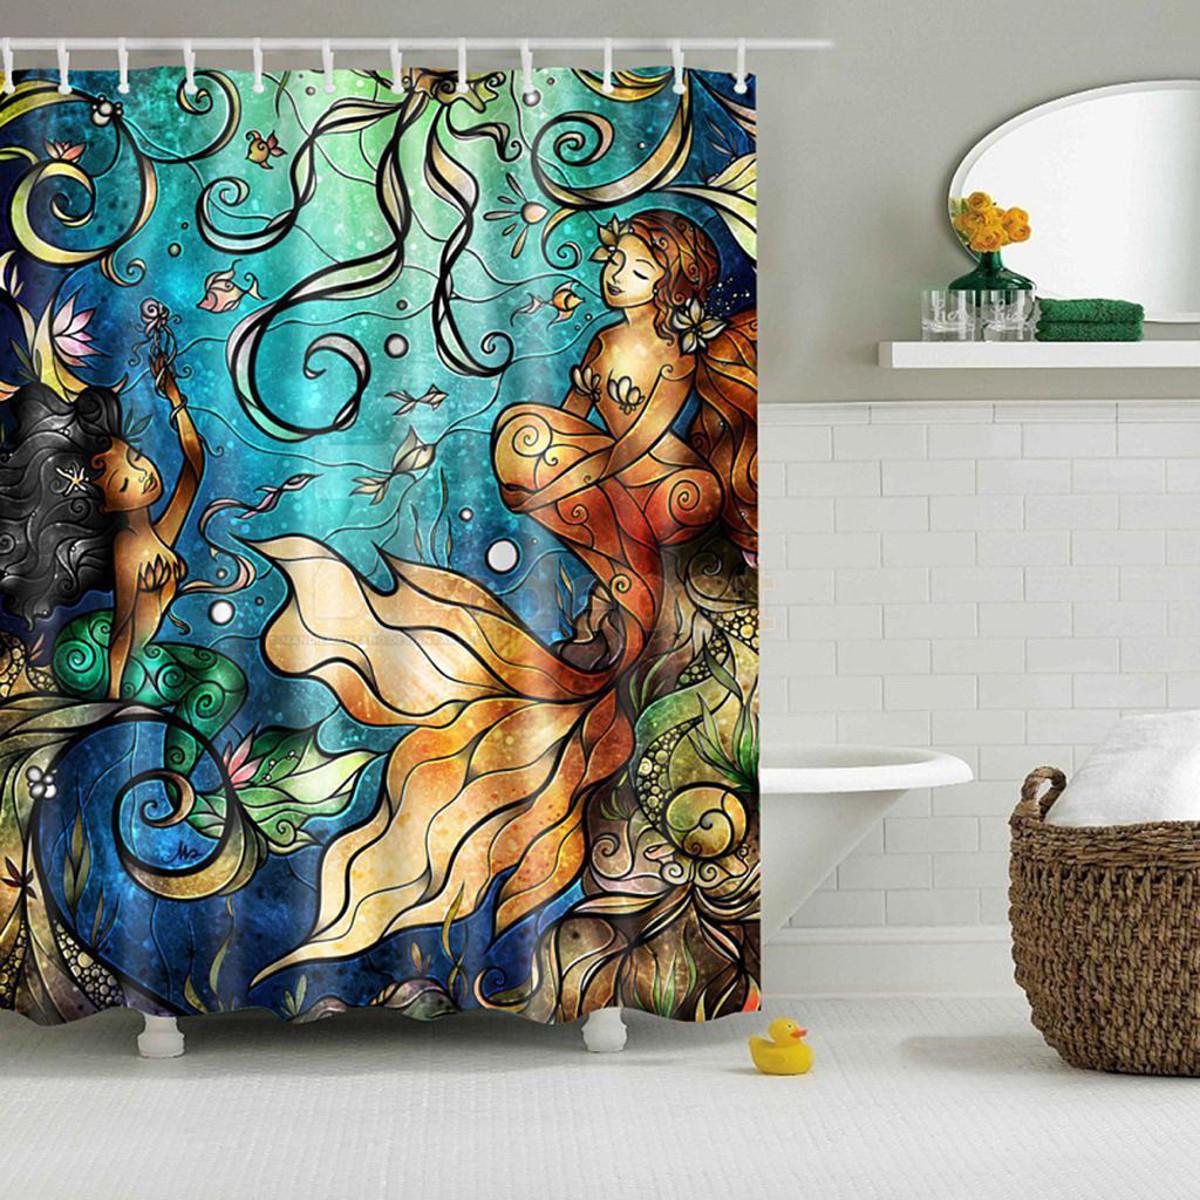 Waterproof Mermaid Scenery Pattern Fabric Shower Curtain Panel Sheer 180 x 180CM